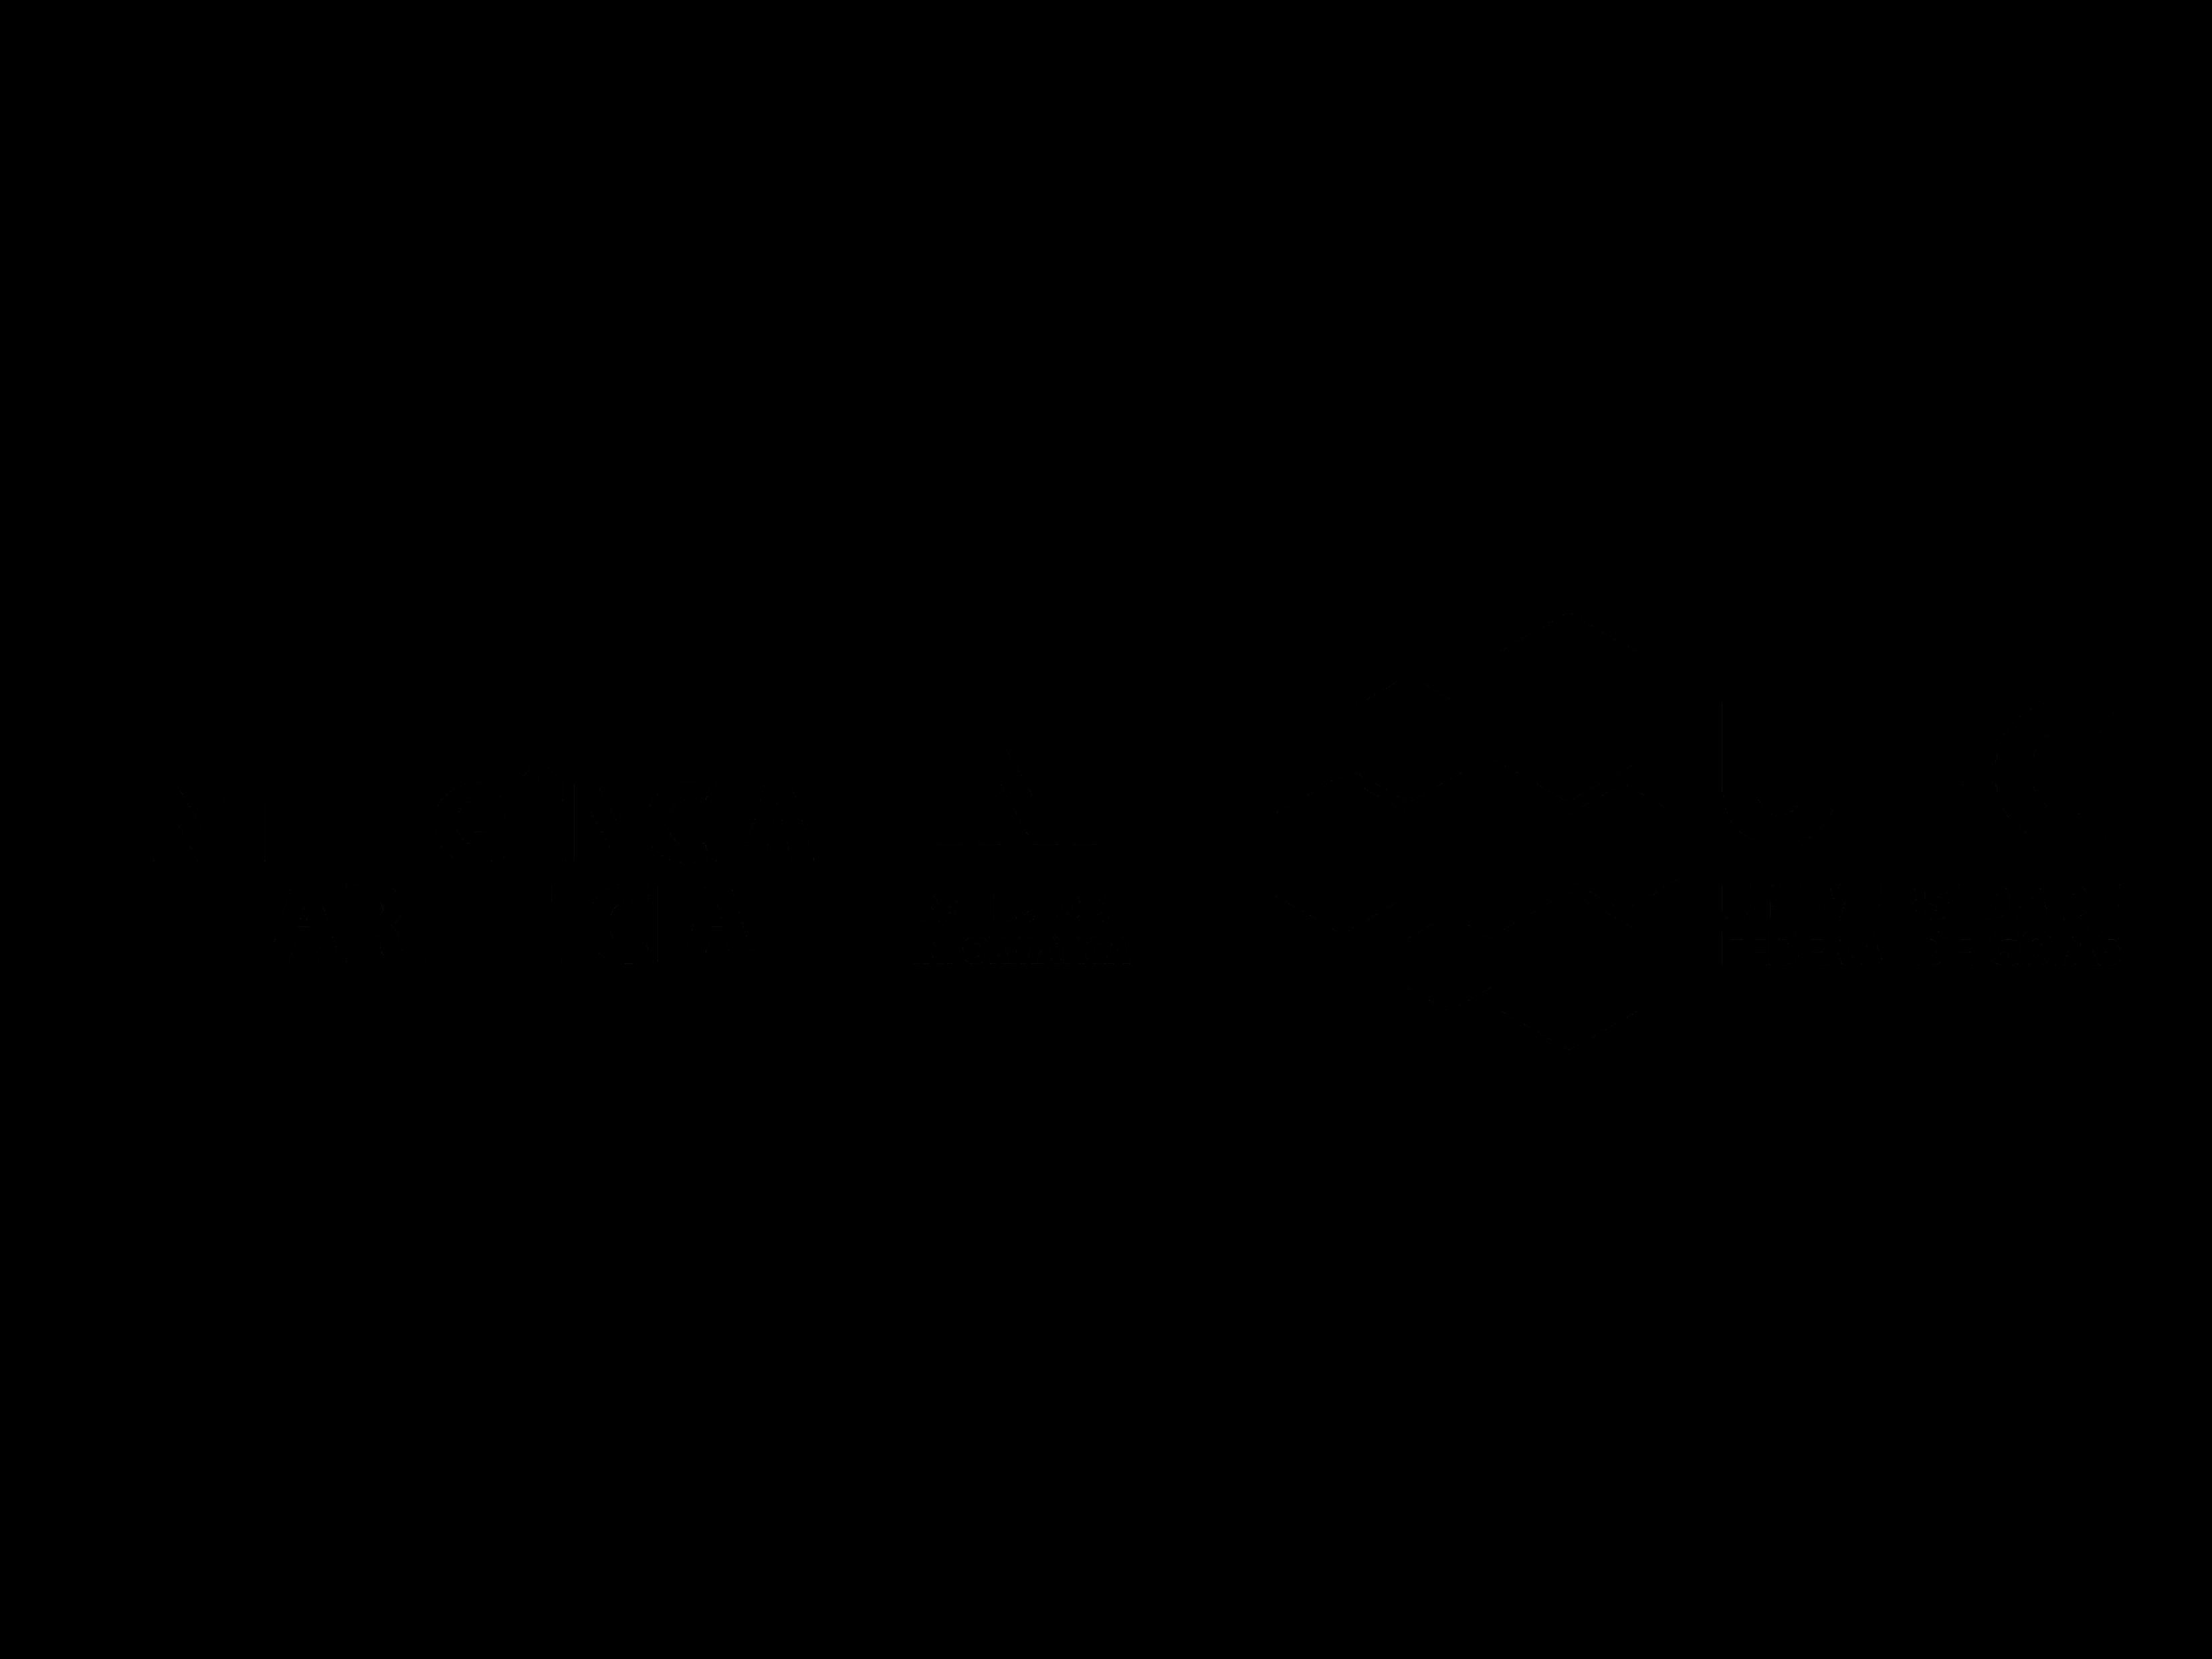 Marca Assinatura Inteligência Artificial Preta 2